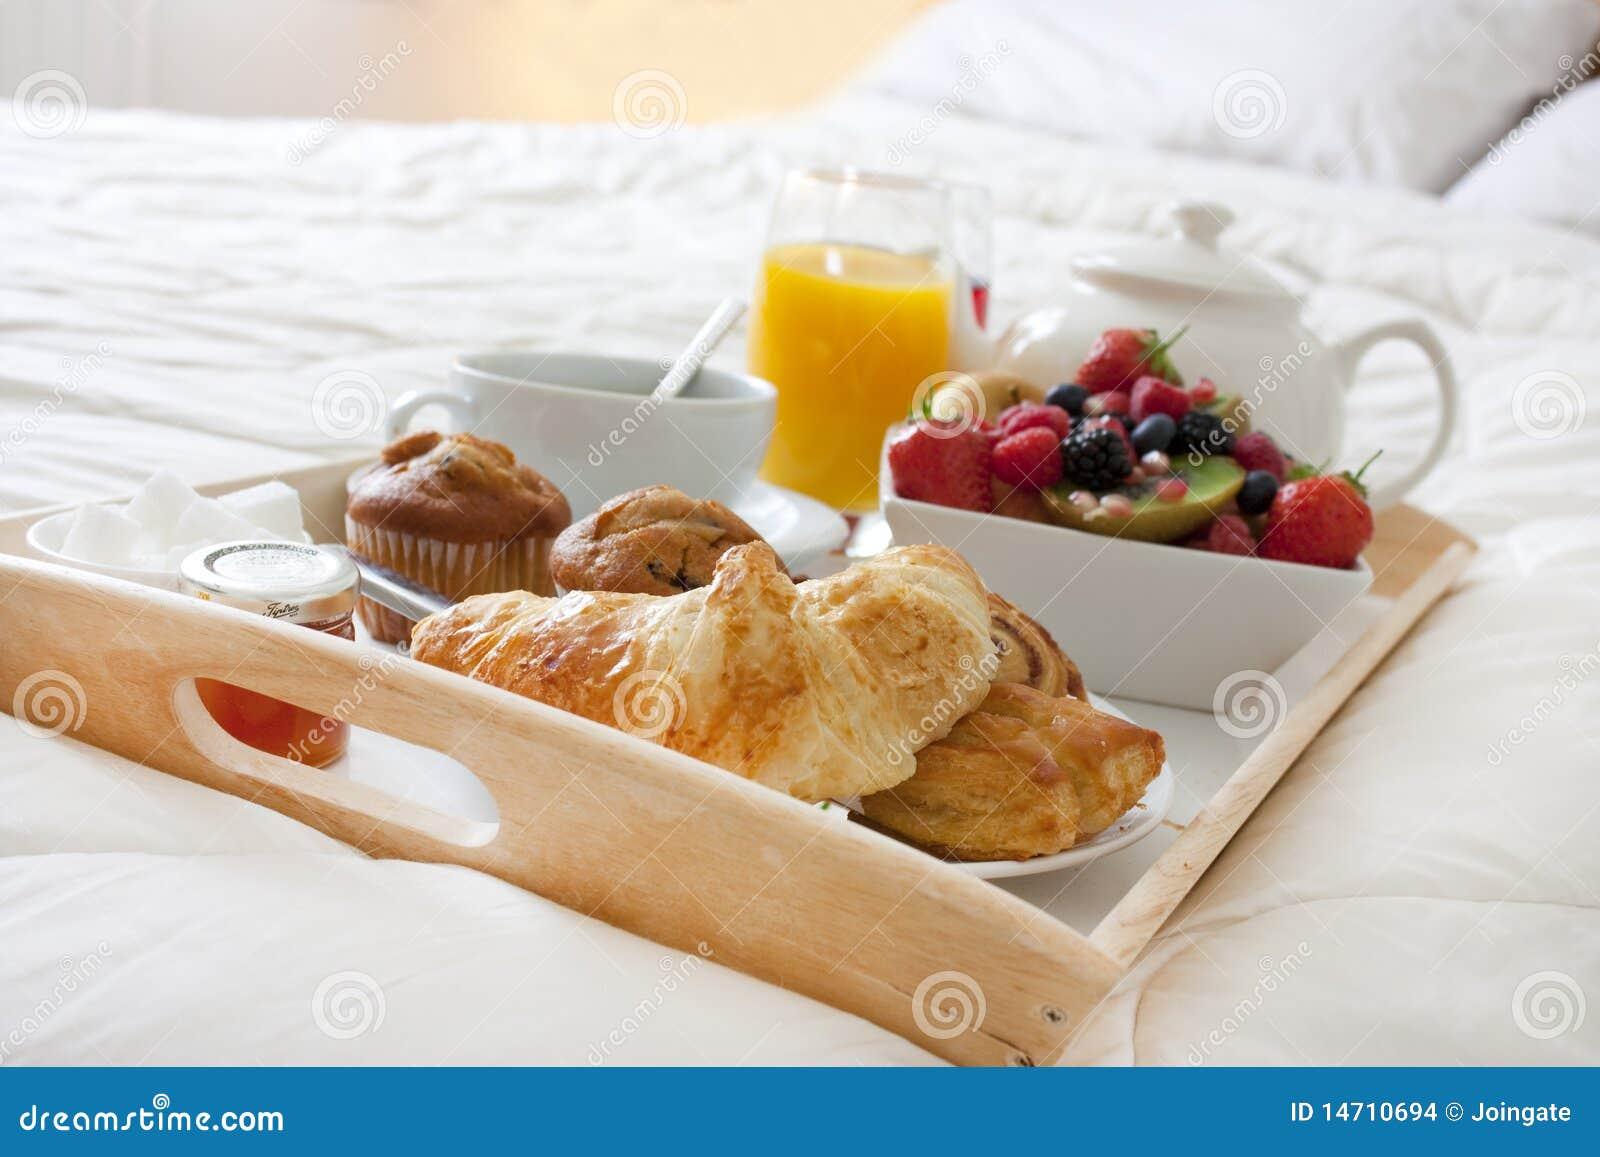 Frühstück Am Bett frühstück im bett stockfoto. bild von kaffee, morgen - 14710694